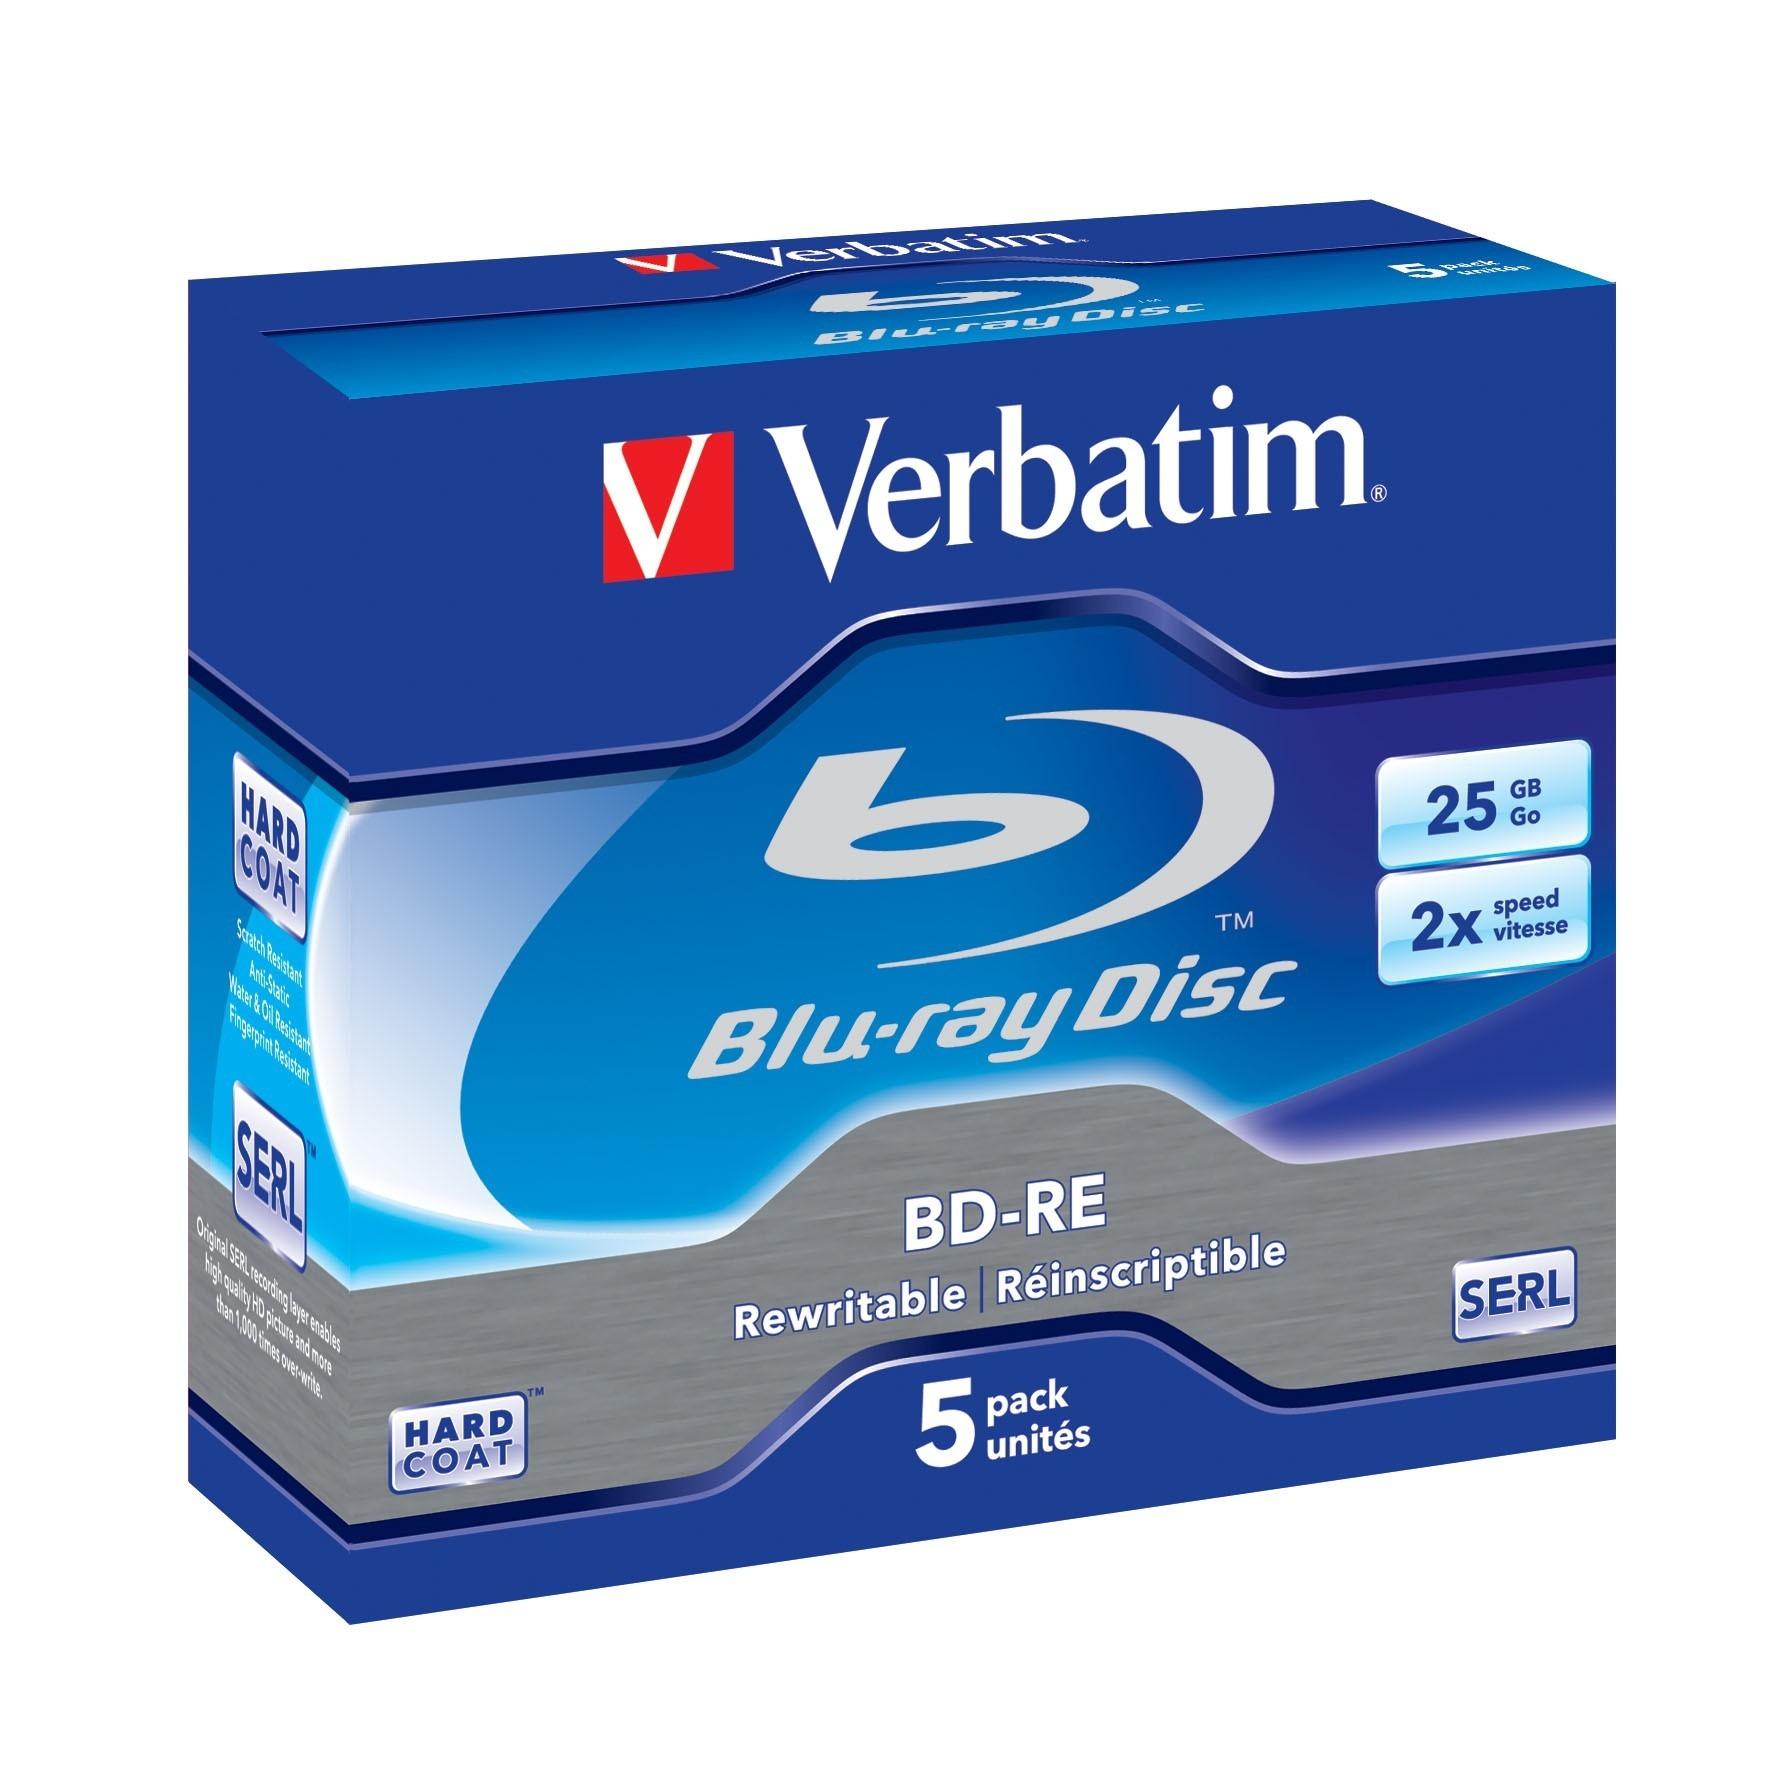 Verbatim Blu-ray BD-RE [ Jewel Case 5 | 25GB | 2x | WHITE BLUE SURFACE HARD COAT